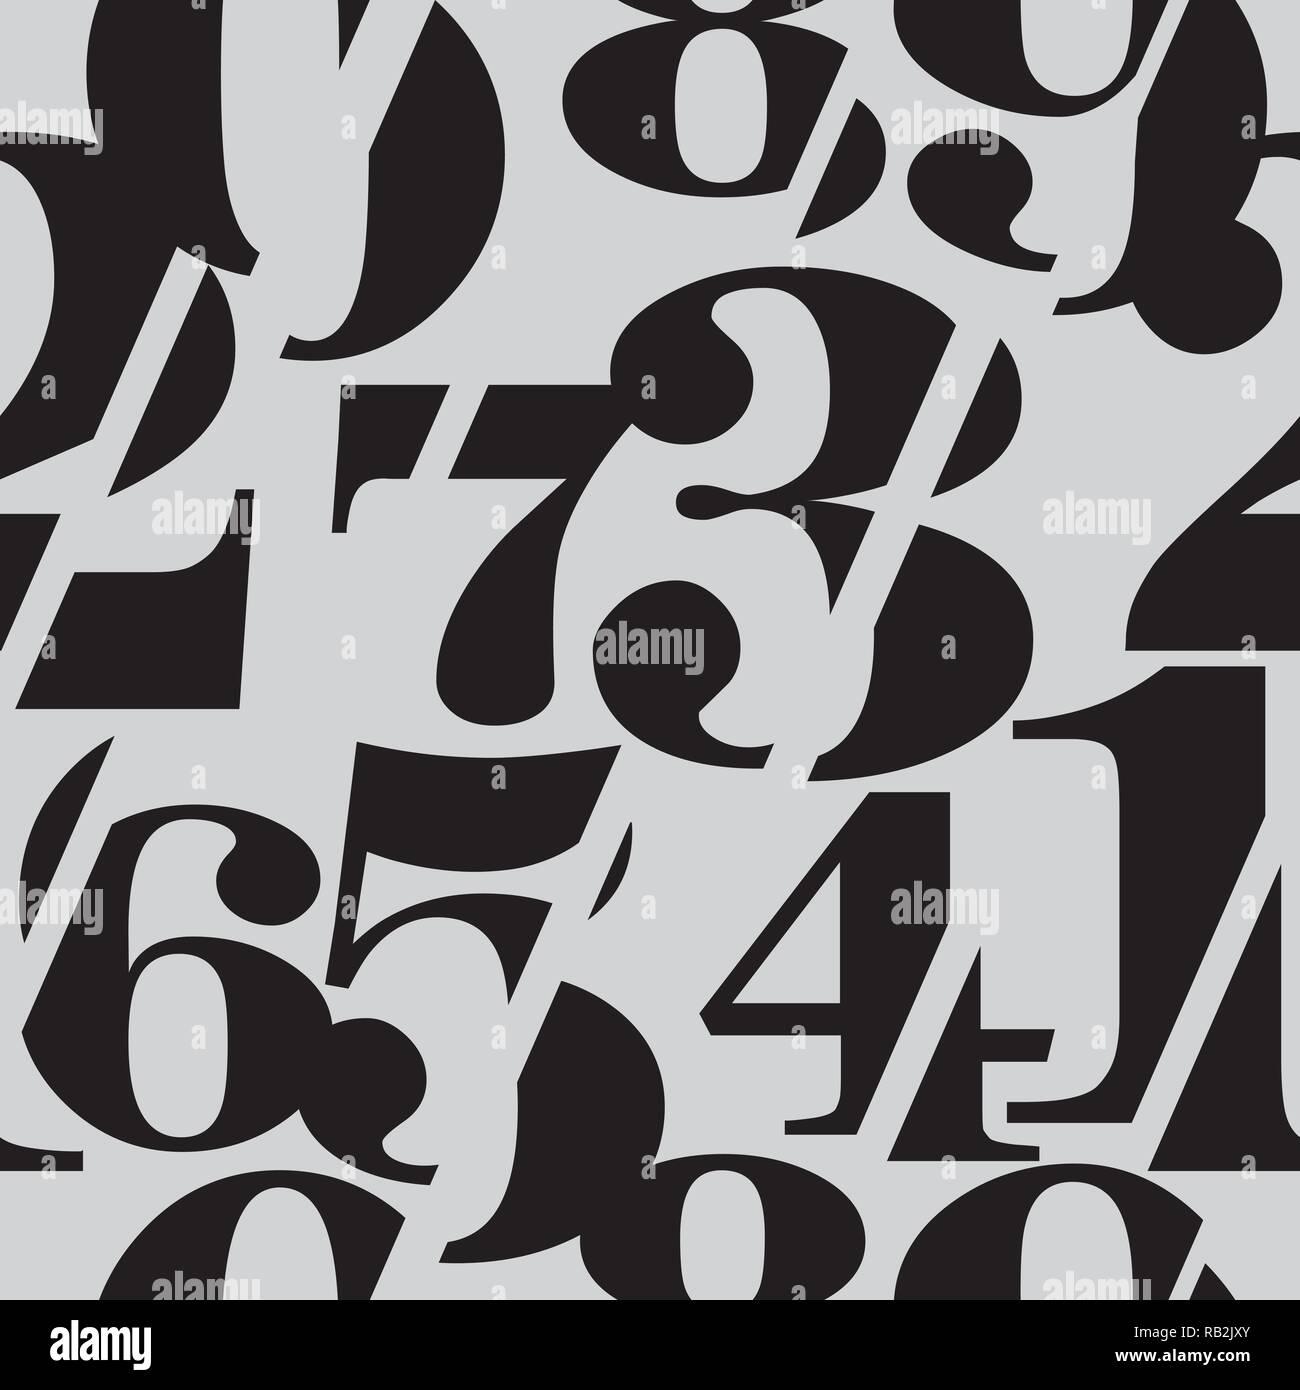 Sliced Serif Numbers Seamless Pattern - Stock Image